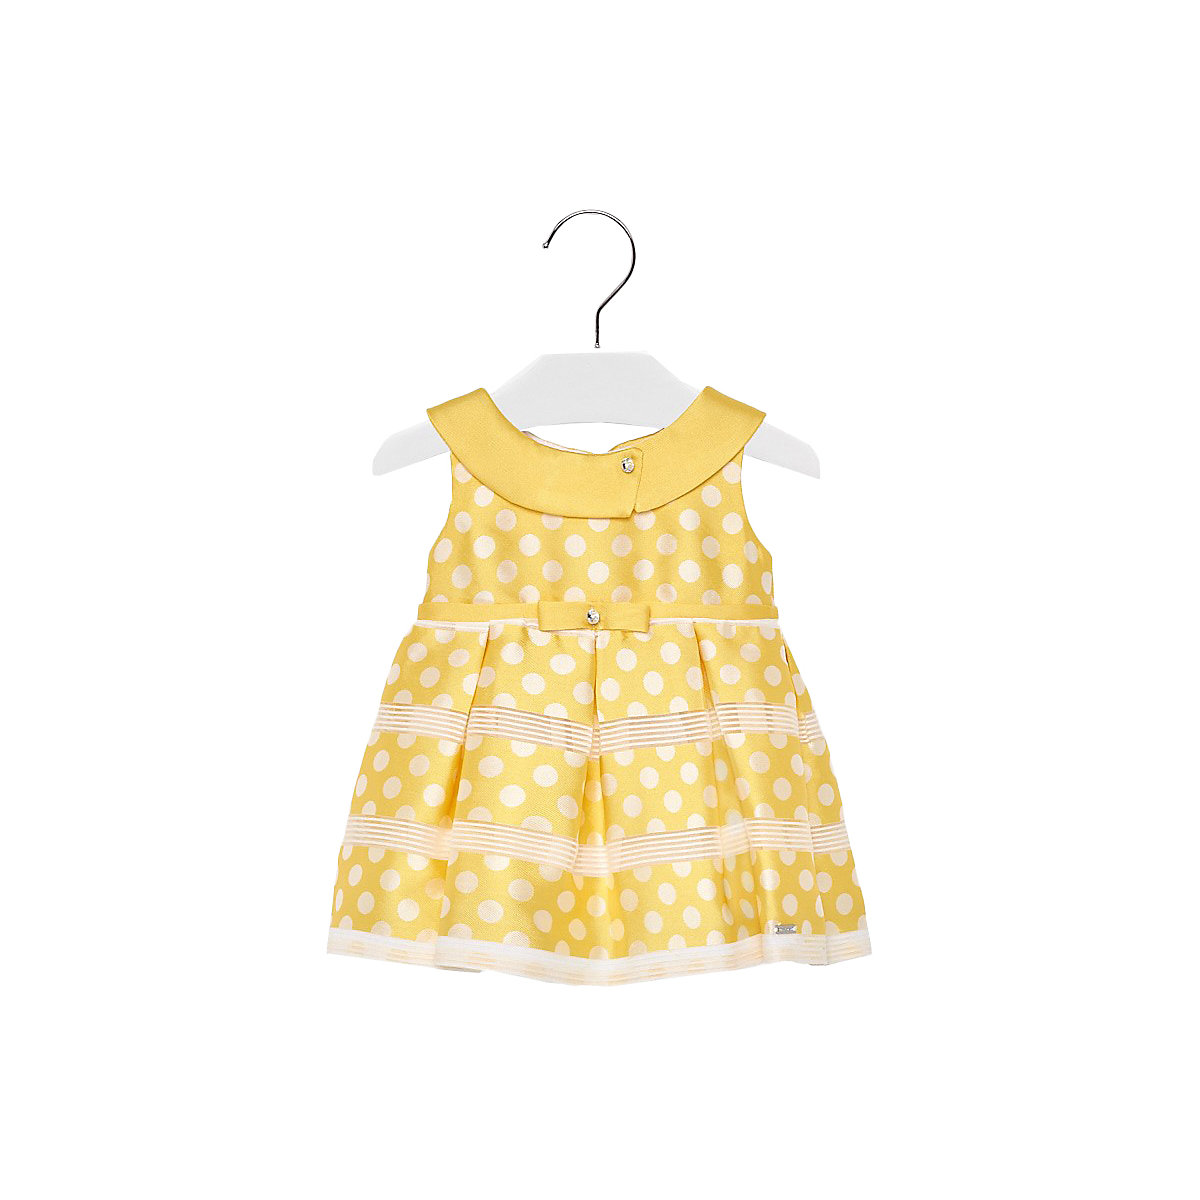 MAYORAL Dresses 10688622 dress for girls baby clothing fashion slim family long sleeve mesh dress for girls